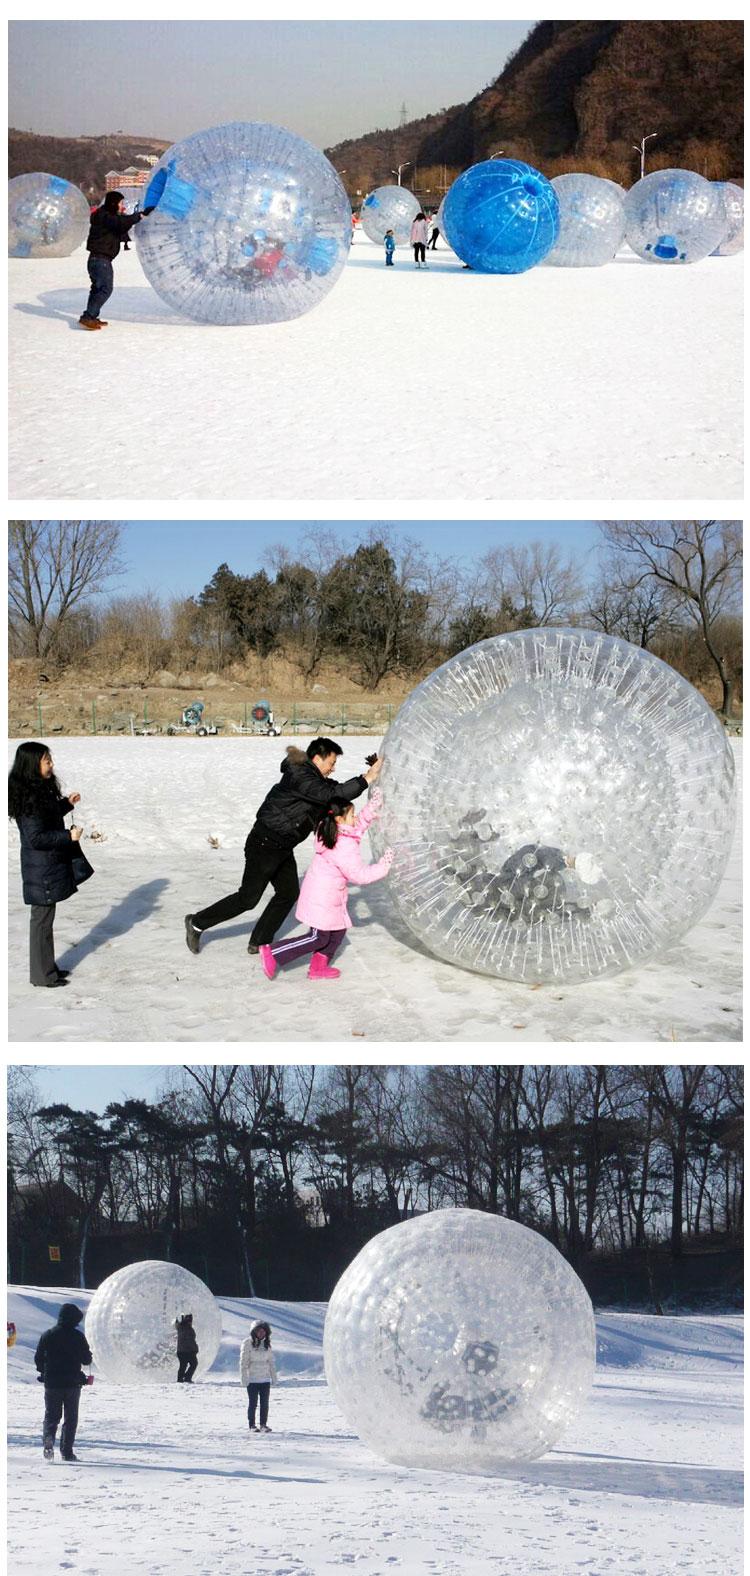 雪地悠波球-雪地悠波球6